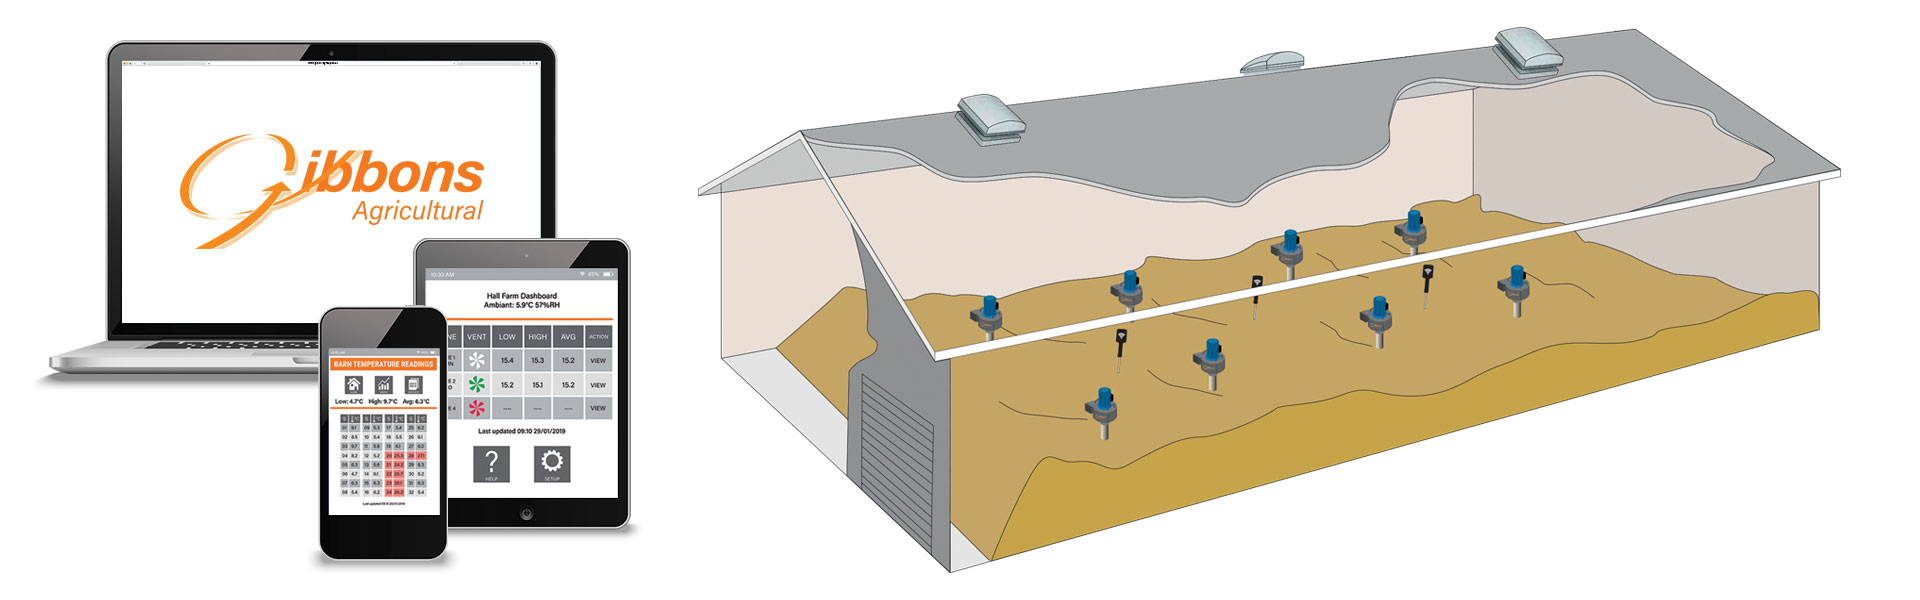 Web based wireless grain cooling